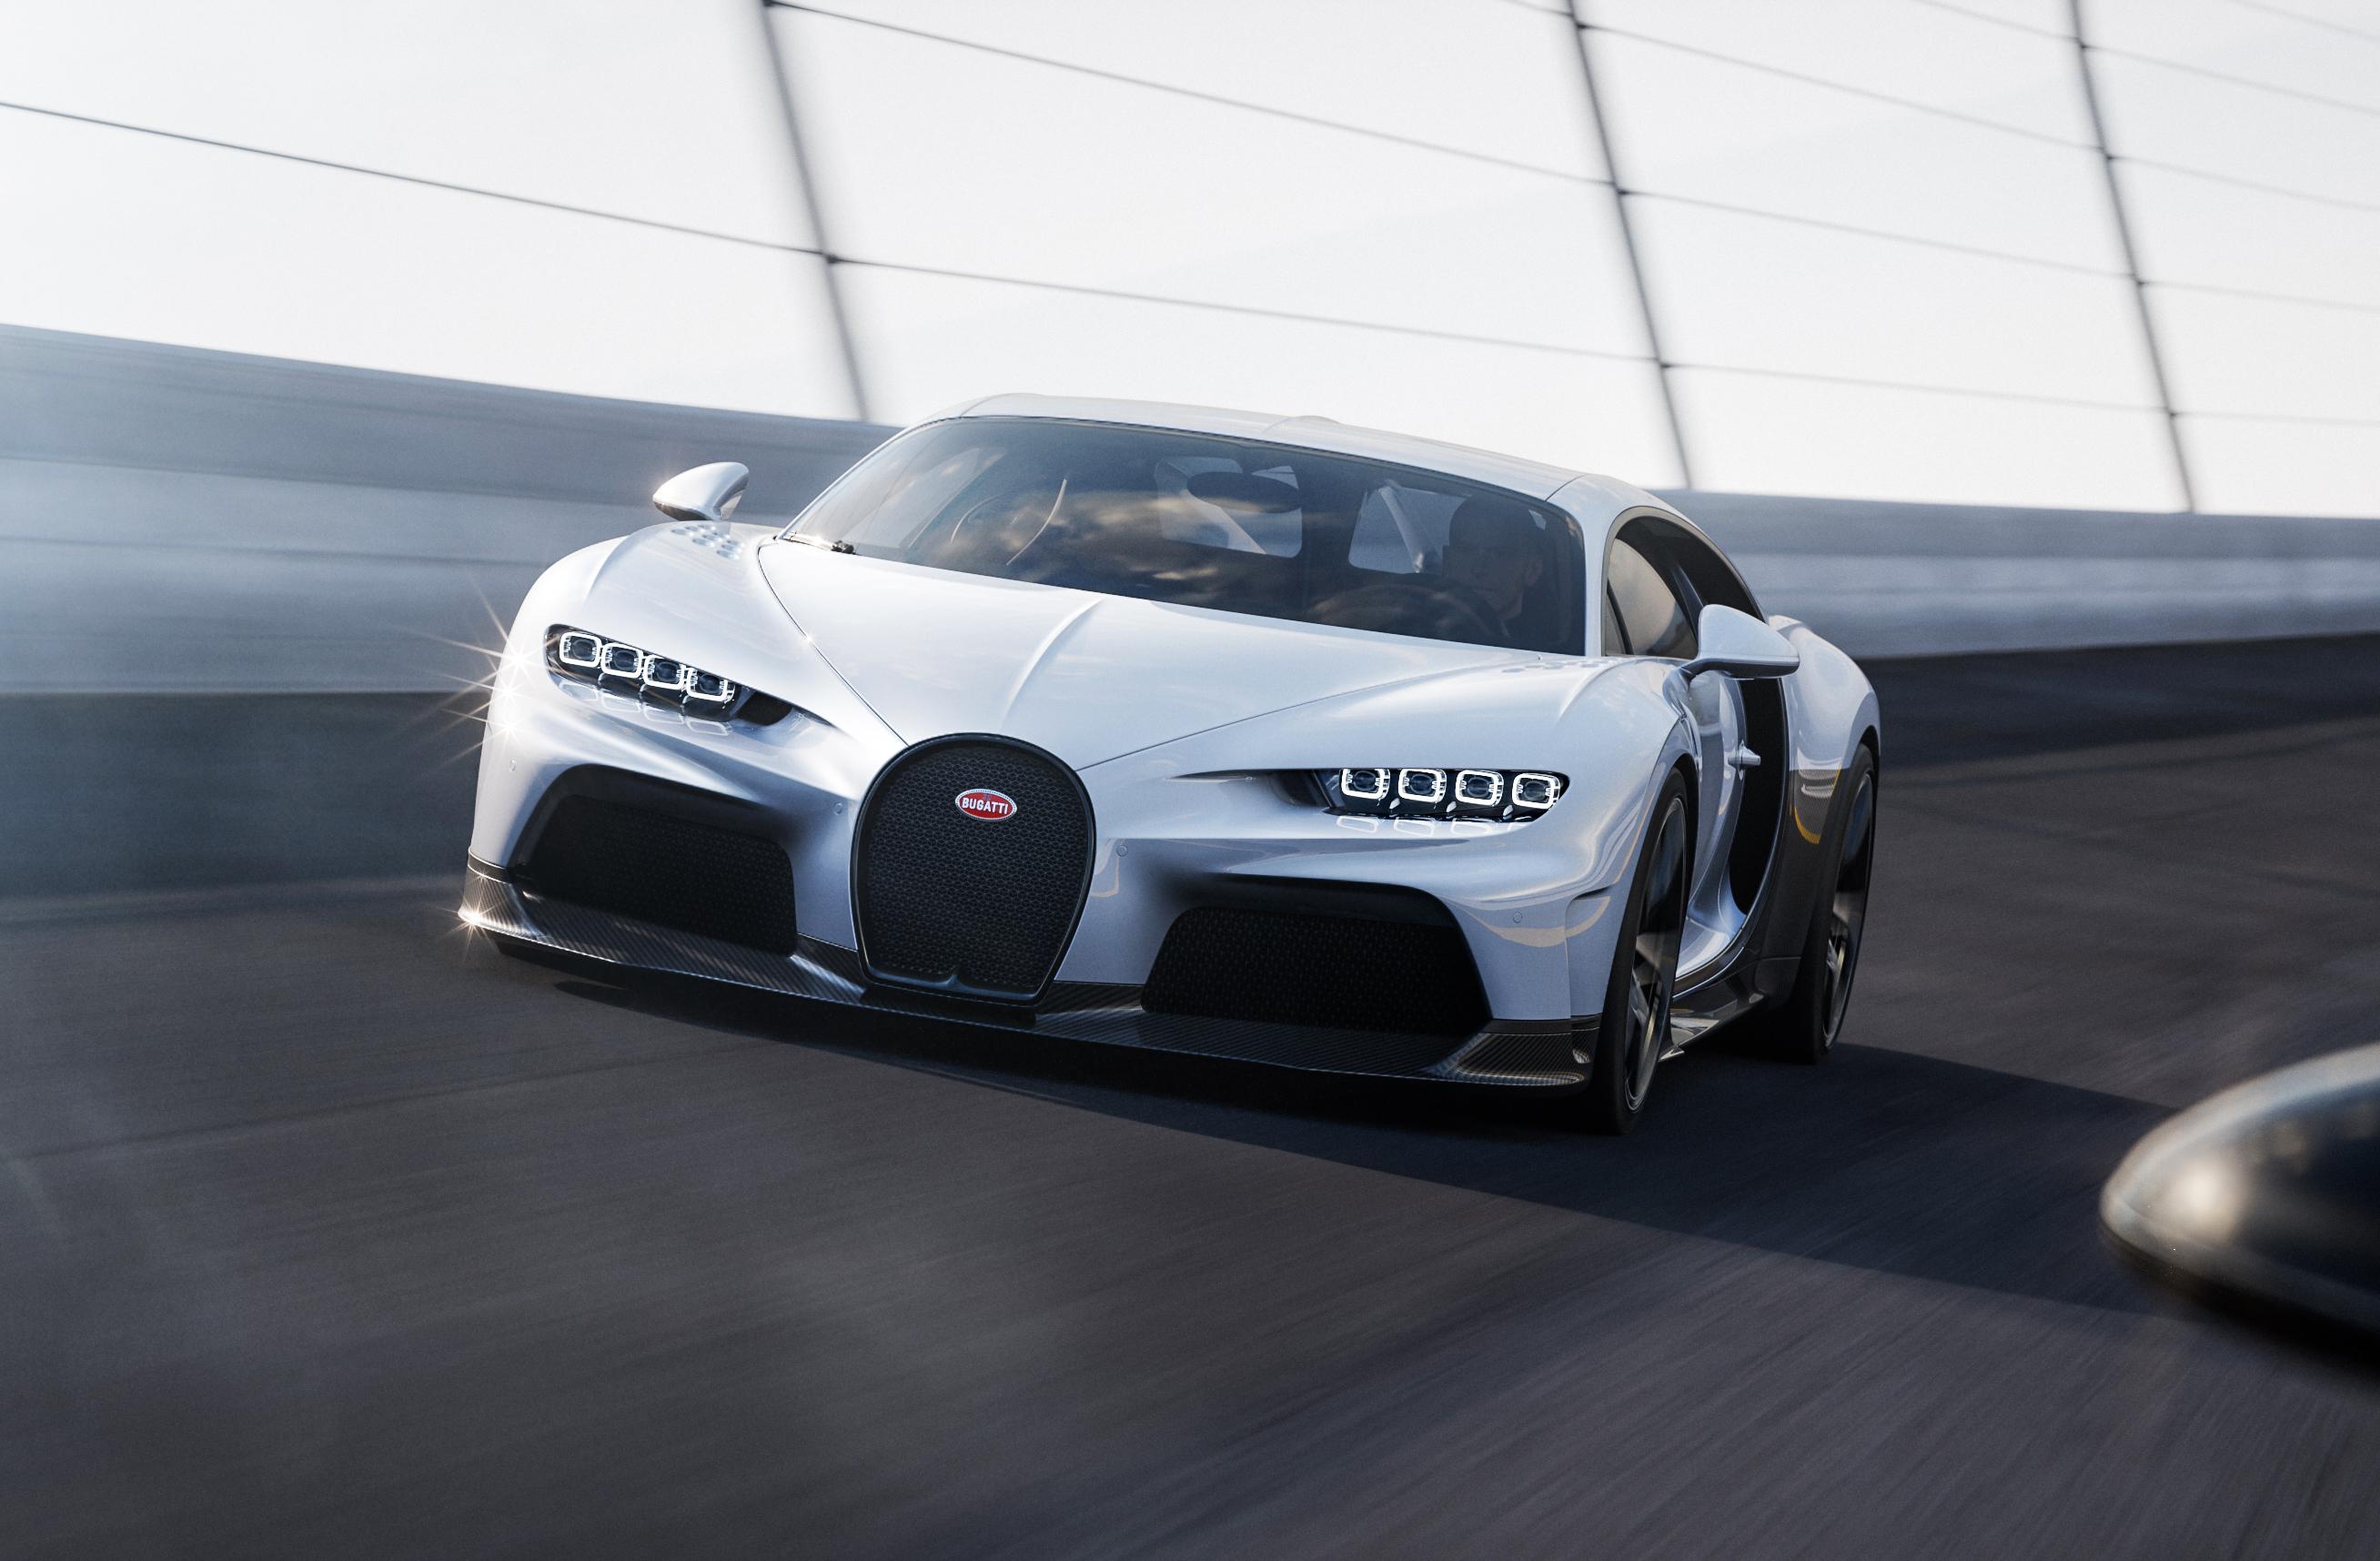 Bugatti Chiron Super Sport – High Speed Oval